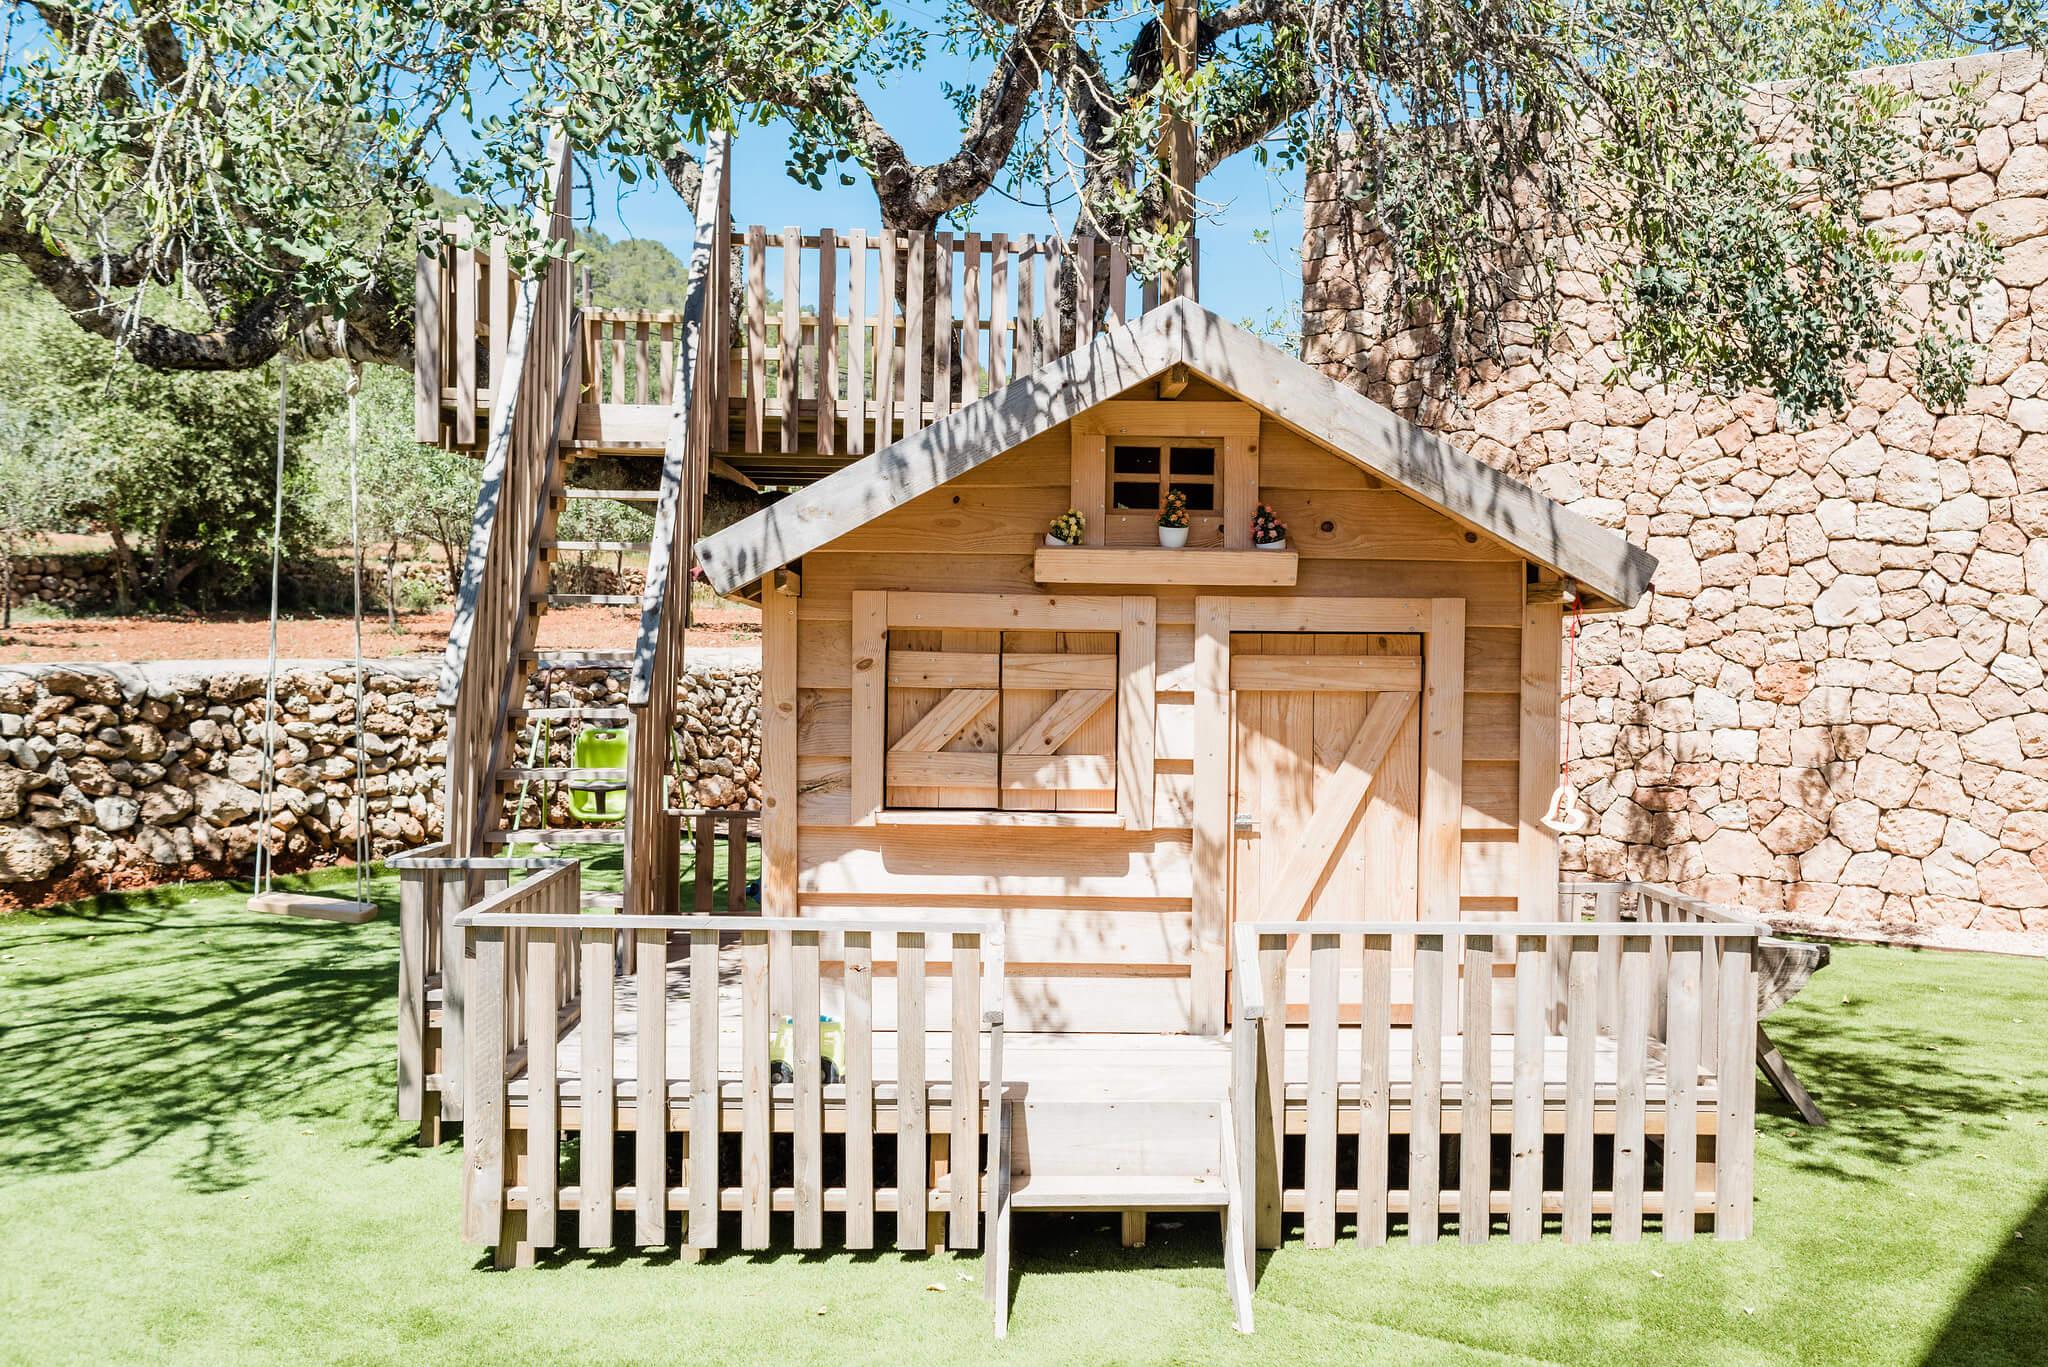 https://www.white-ibiza.com/wp-content/uploads/2020/06/white-ibiza-villas-can-carmen-exterior-wendy-house.jpg